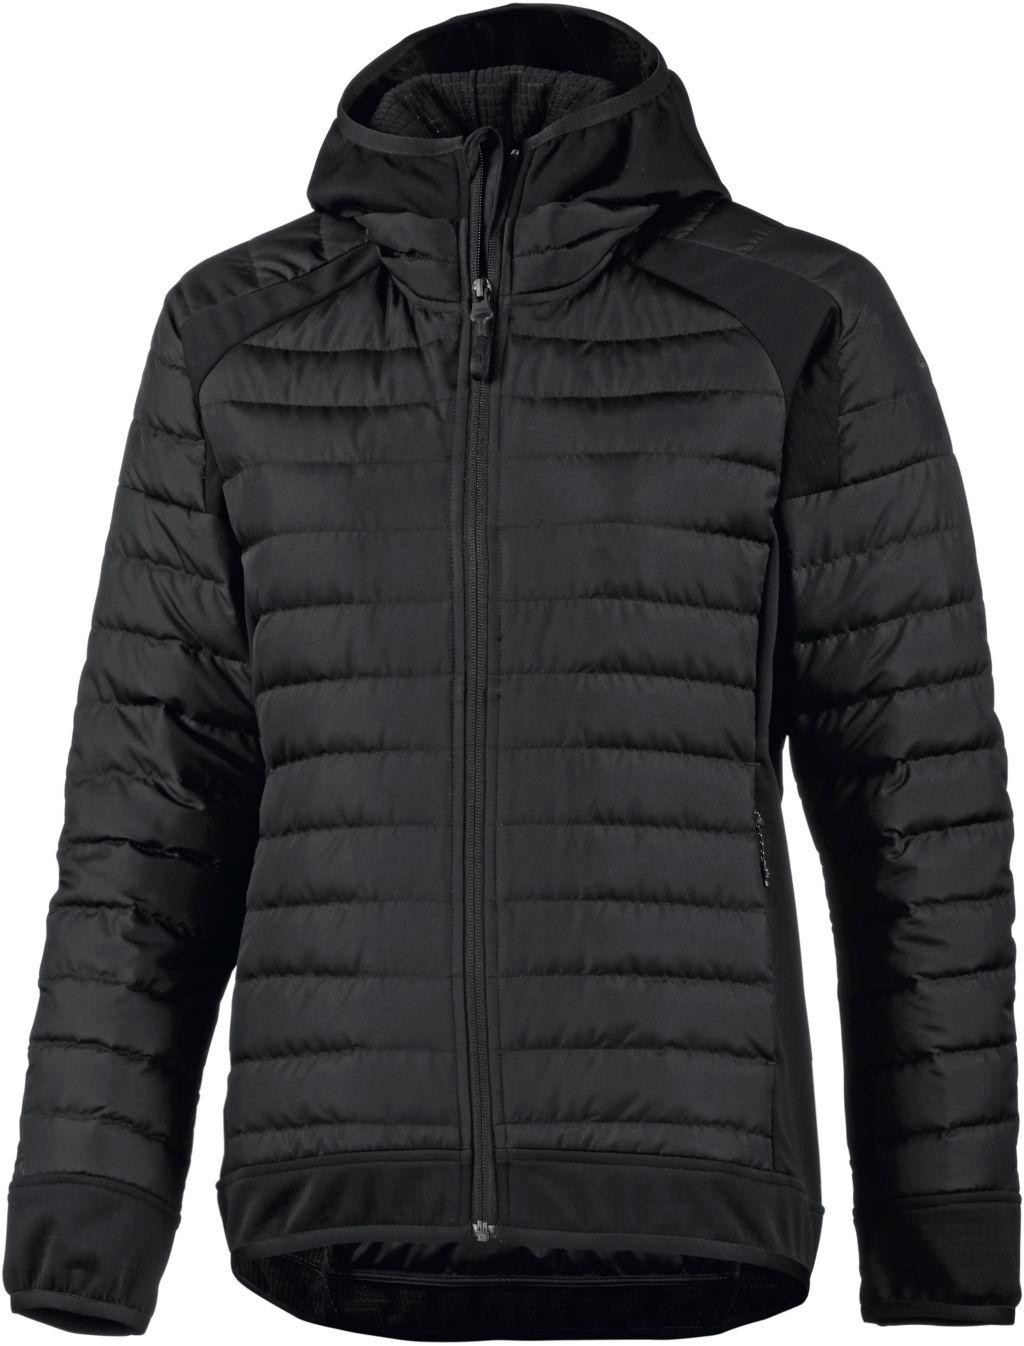 Hybrid Daunenjacke Damen in schwarz, Größe 36